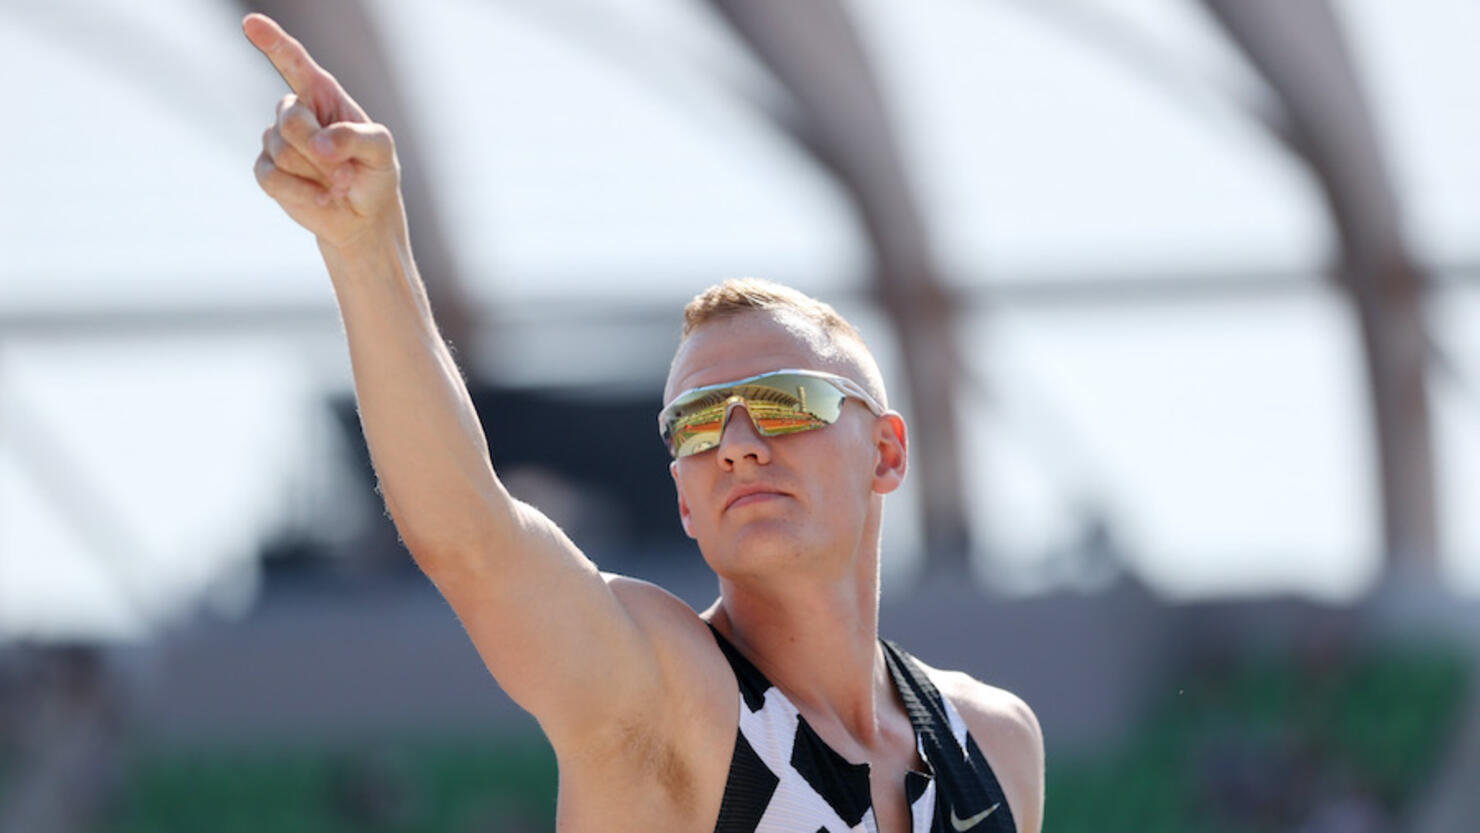 2020 U.S. Olympic Track & Field Team Trials - Day 4